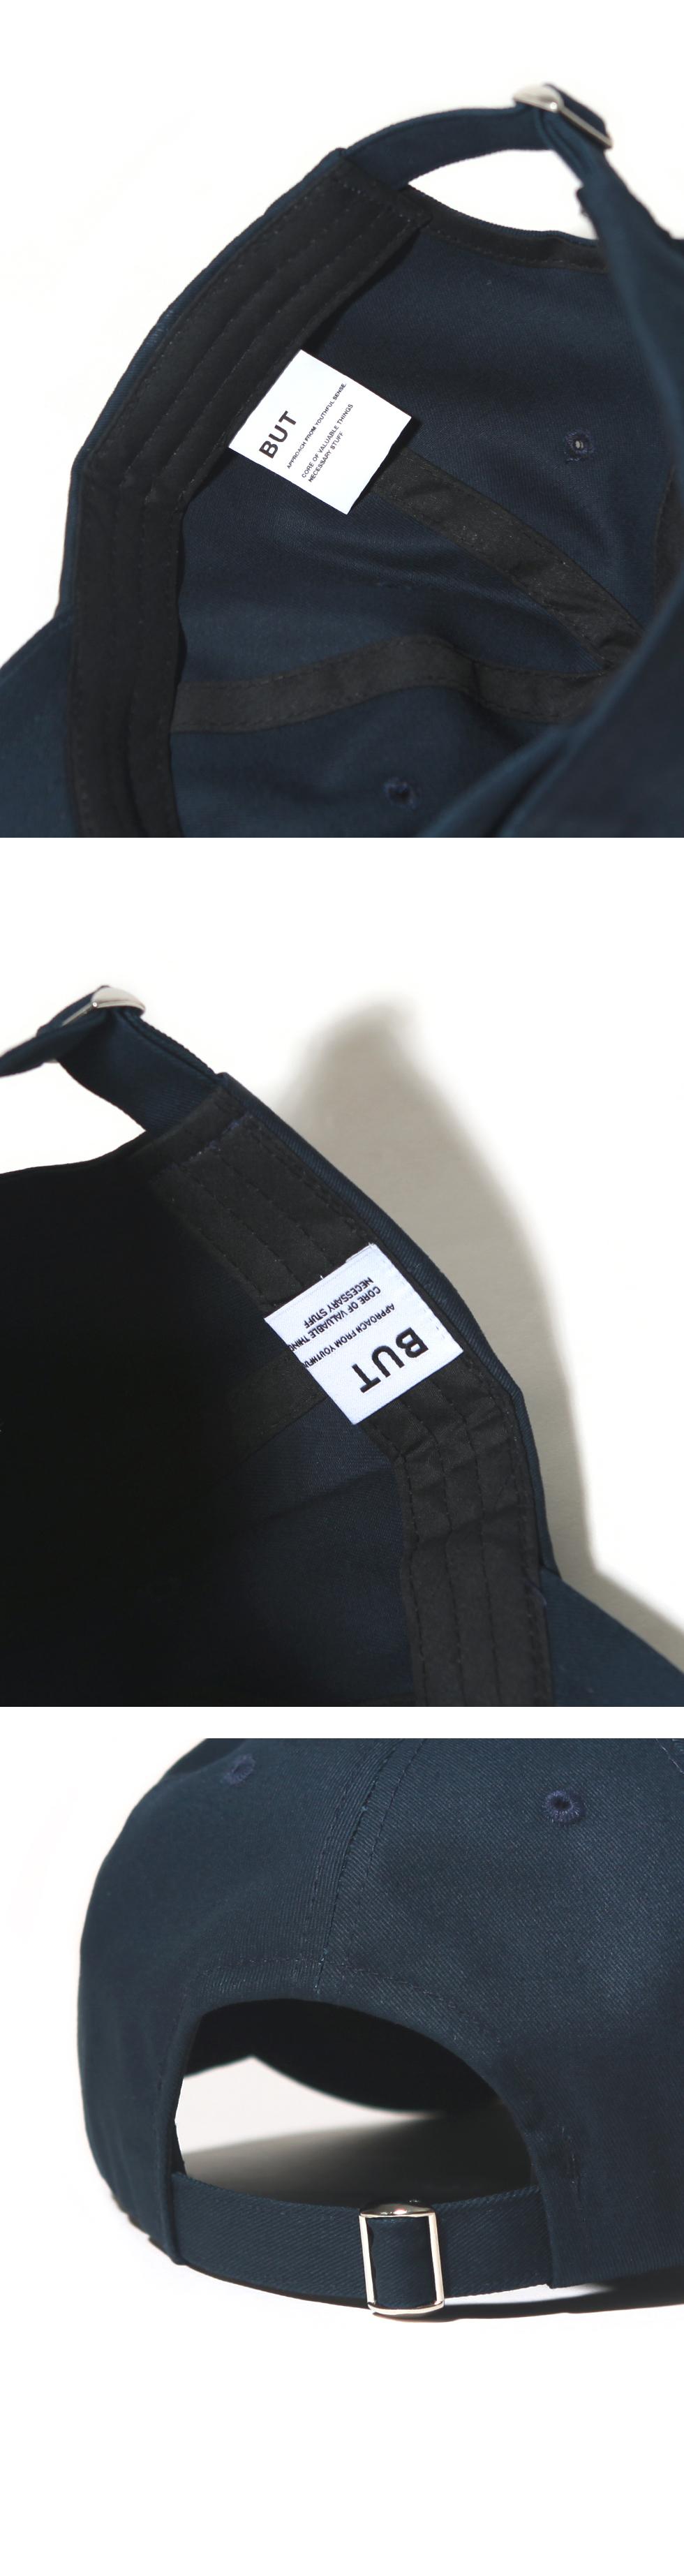 OVAL CURVED CAP-NAVY 9/16 예약배송